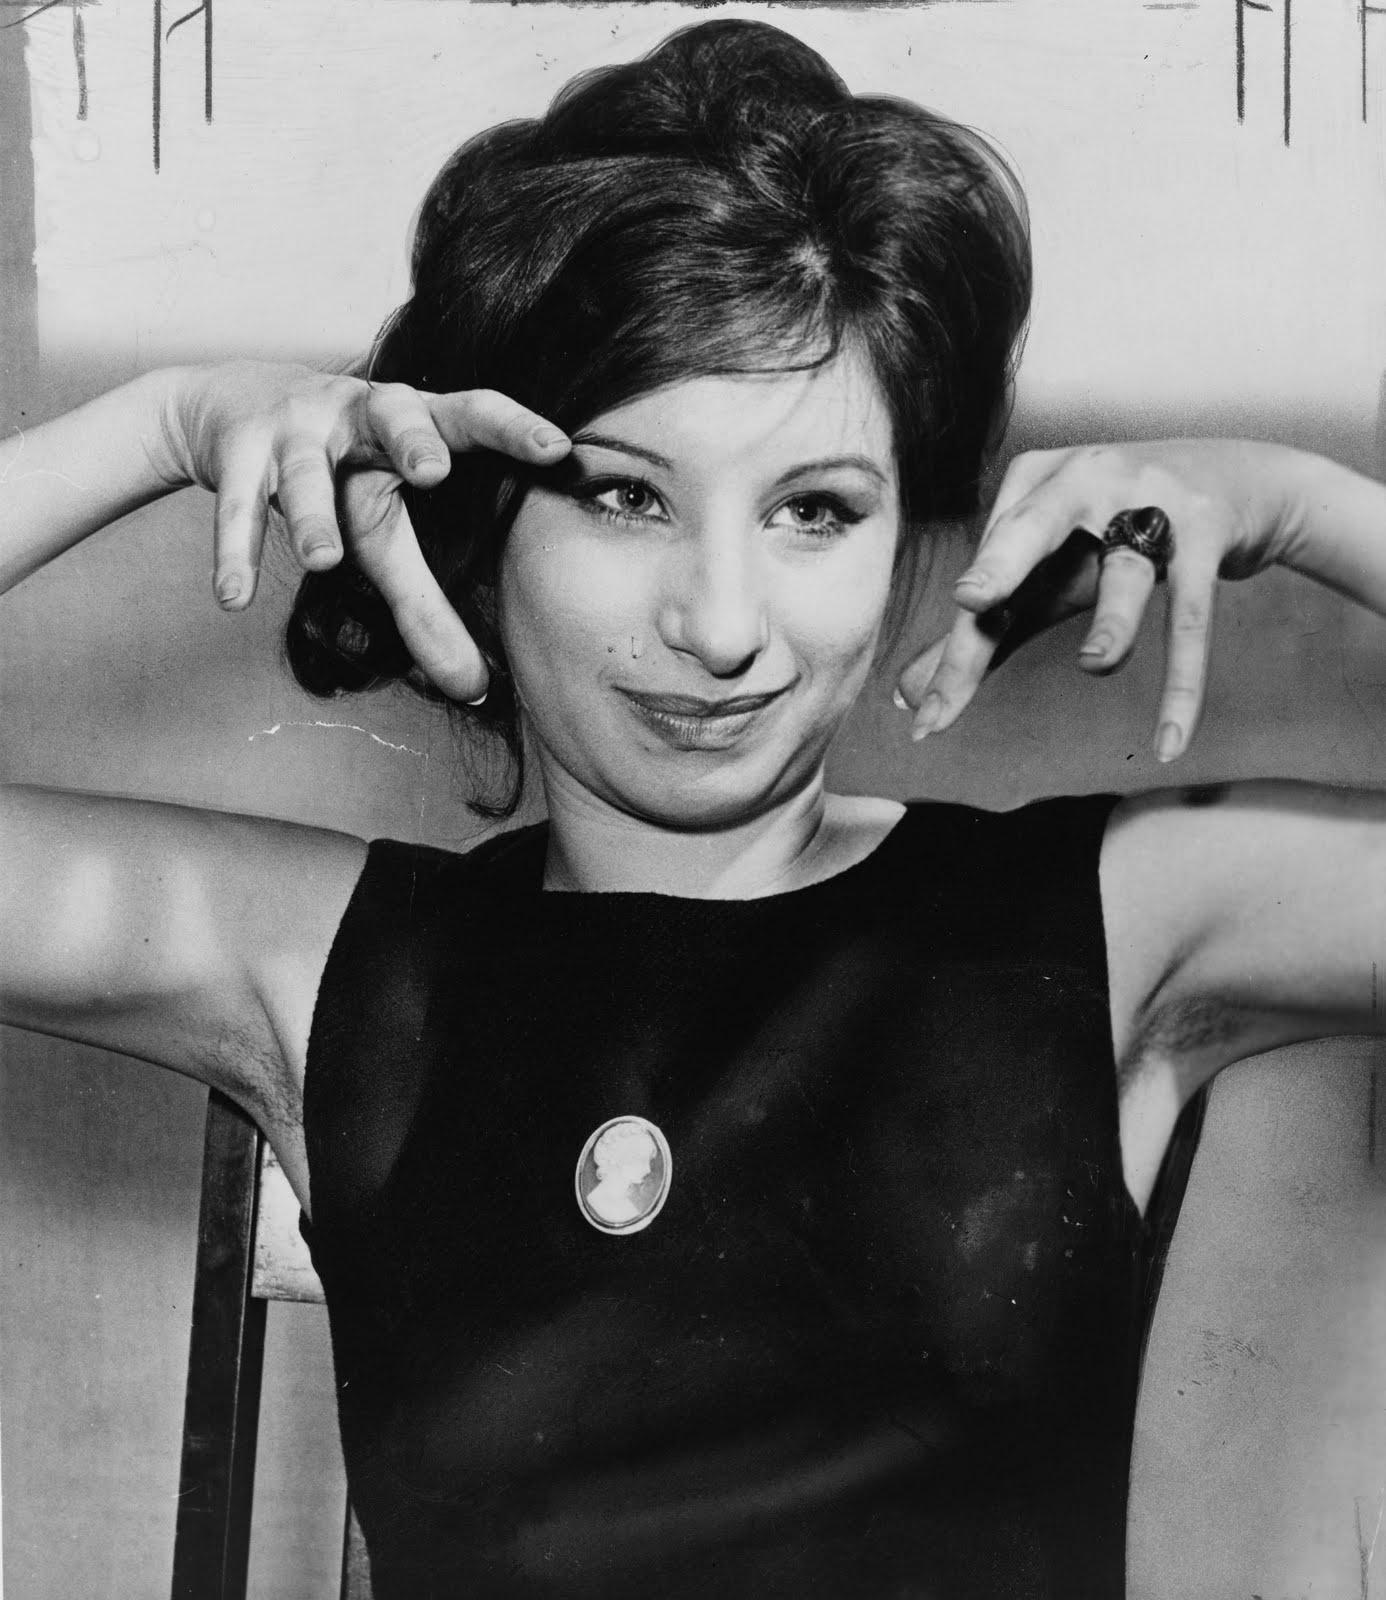 http://4.bp.blogspot.com/_nozRGV7oj-M/S9MblR8tc5I/AAAAAAAACsw/6lFVoBnkKFo/s1600/Barbra_Streisand_1962.jpg